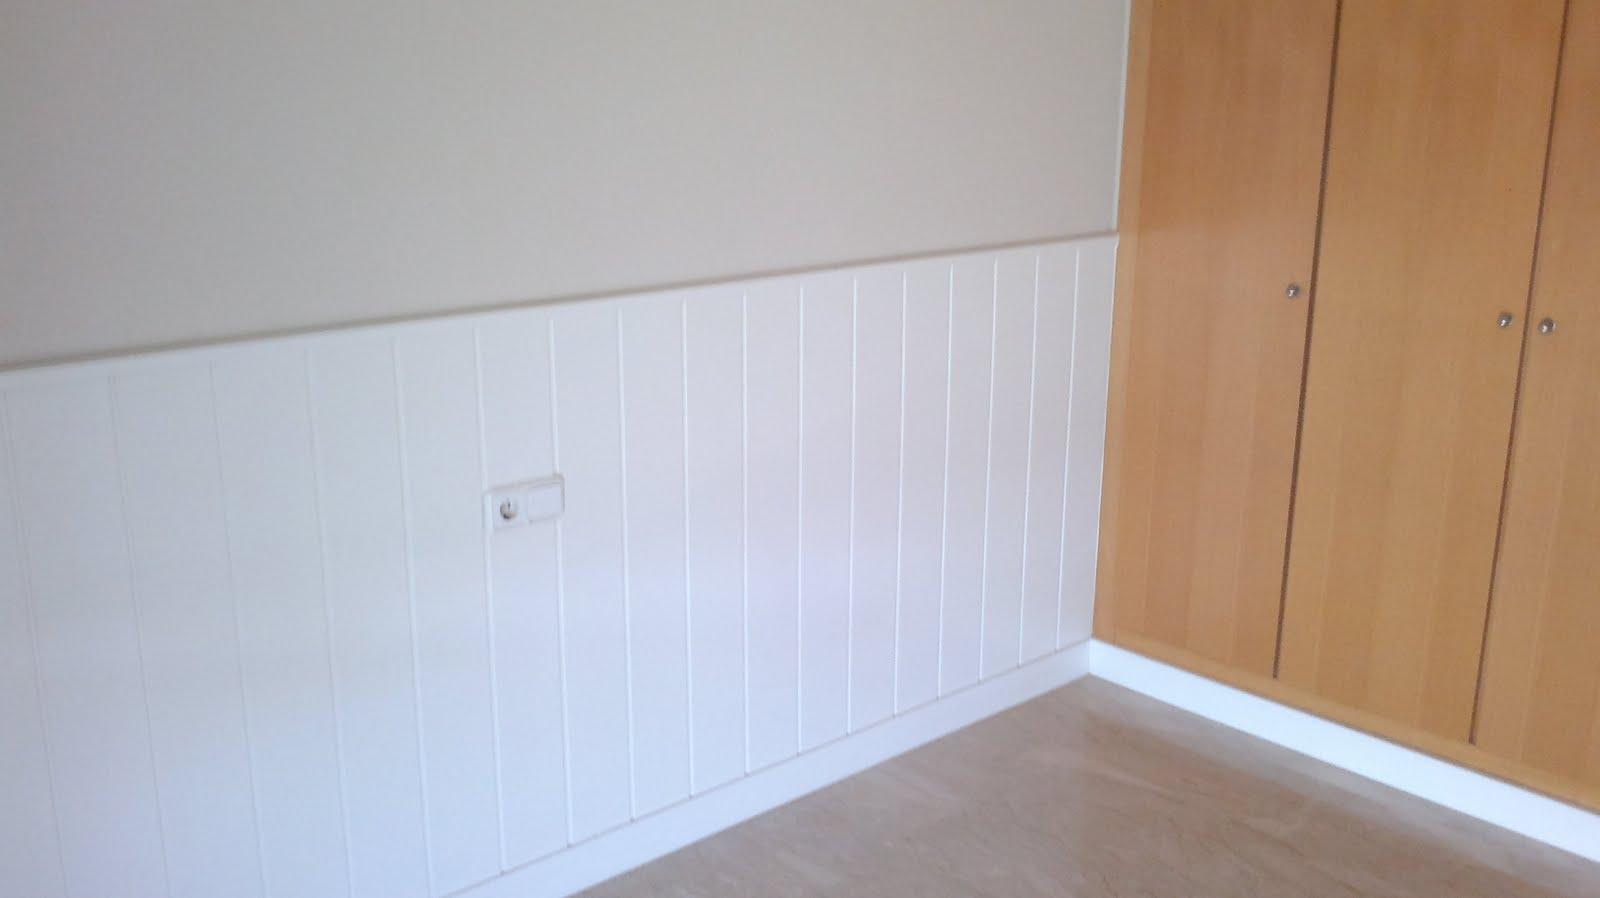 Dormitorio muebles modernos friso blanco for Friso pvc precios